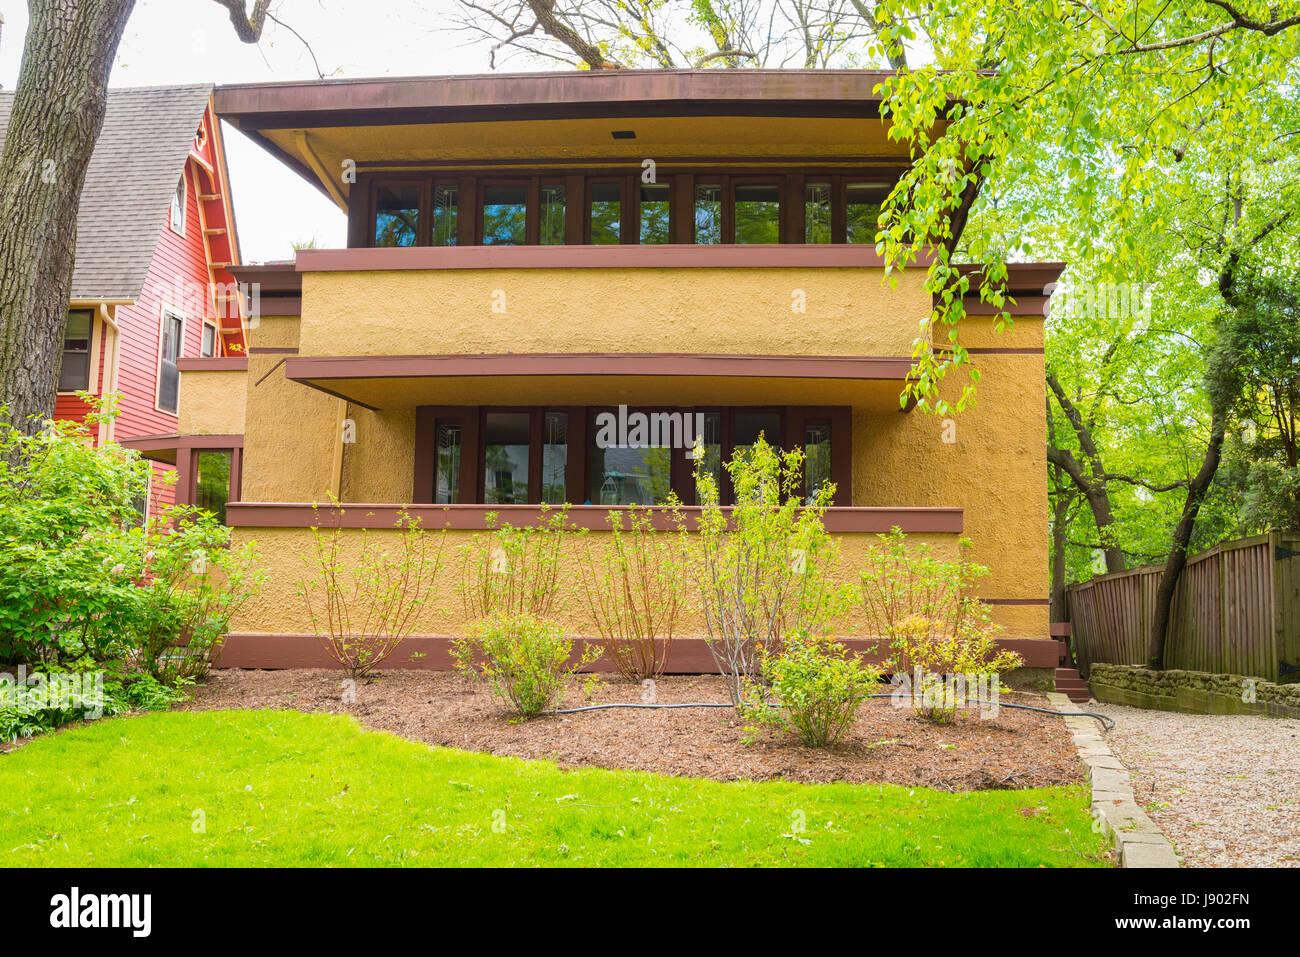 Chicago Illinois Oak Park 6 Elizabeth Court by Frank Lloyd Wright Architect 1867 to 1959 Laura Gale House home residence - Stock Image